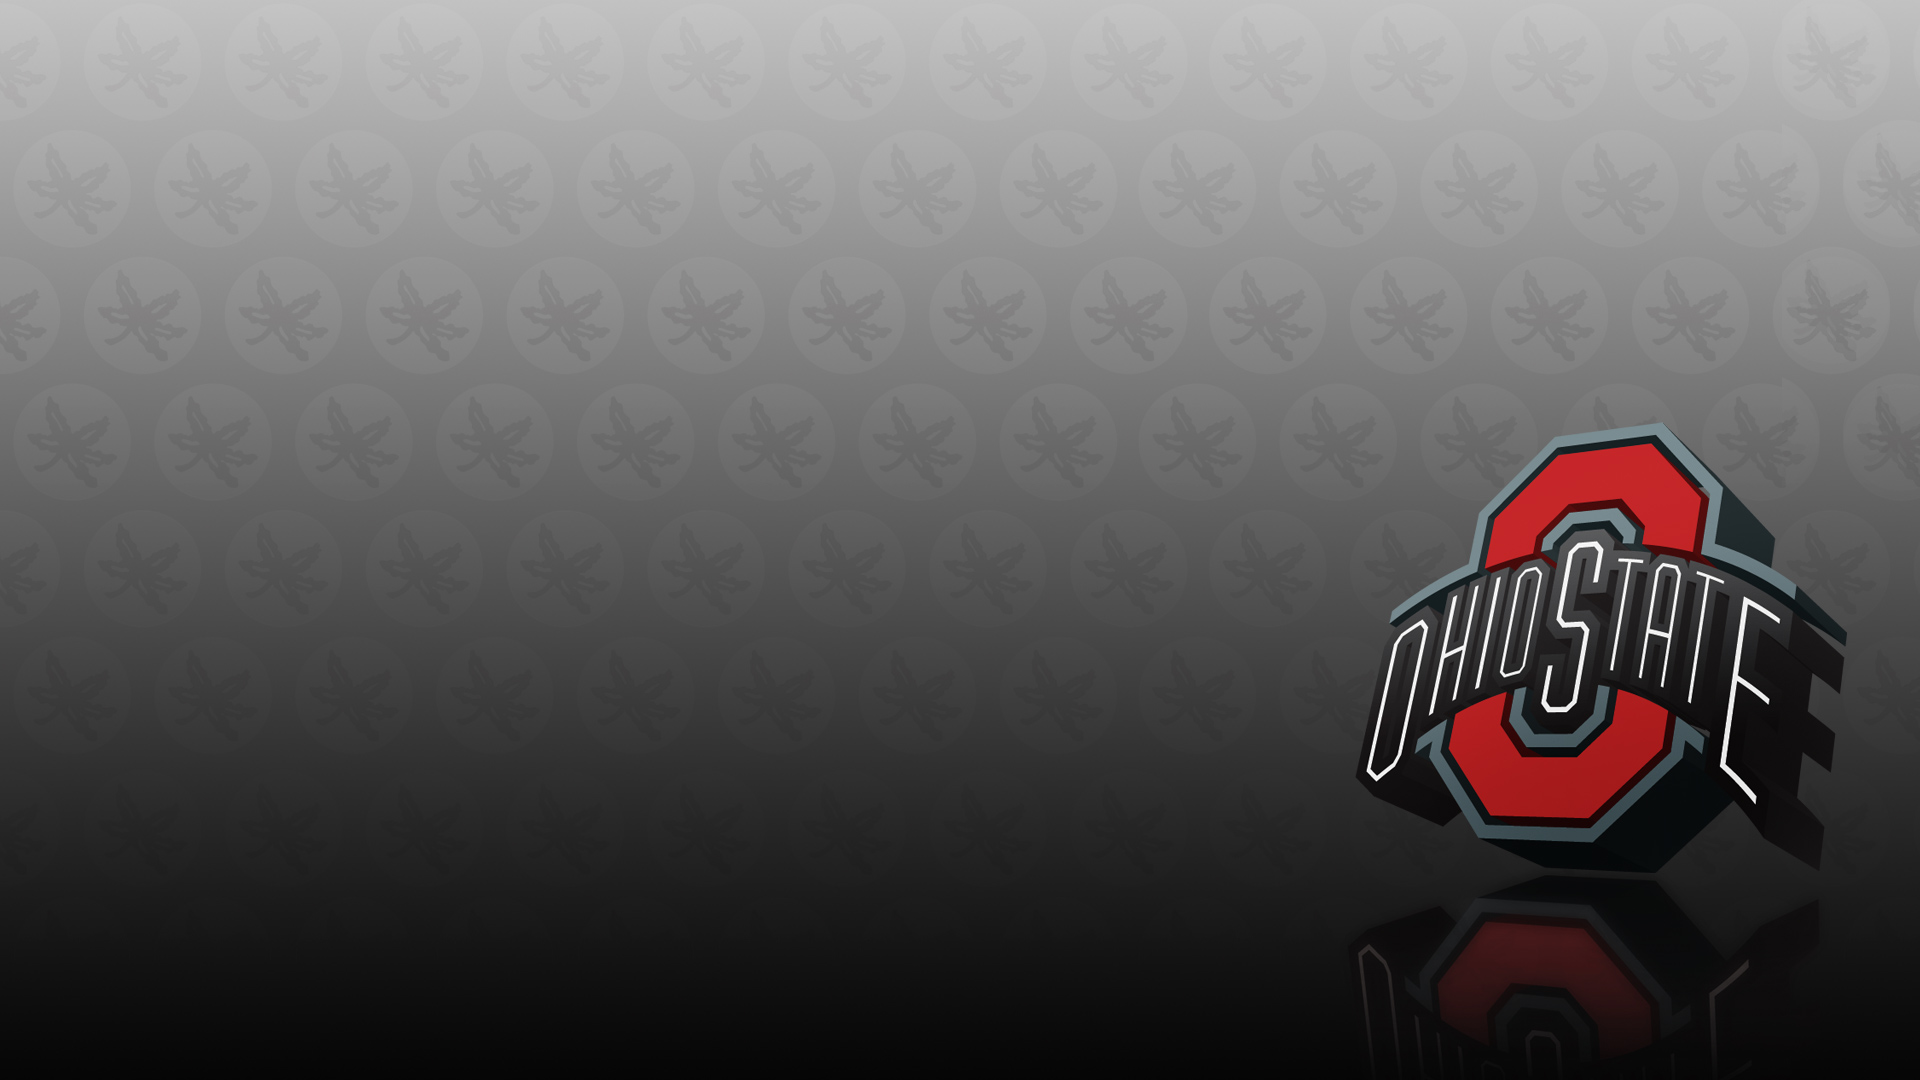 Ohio State Logo Wallpaper: Ohio State Football HD Wallpapers